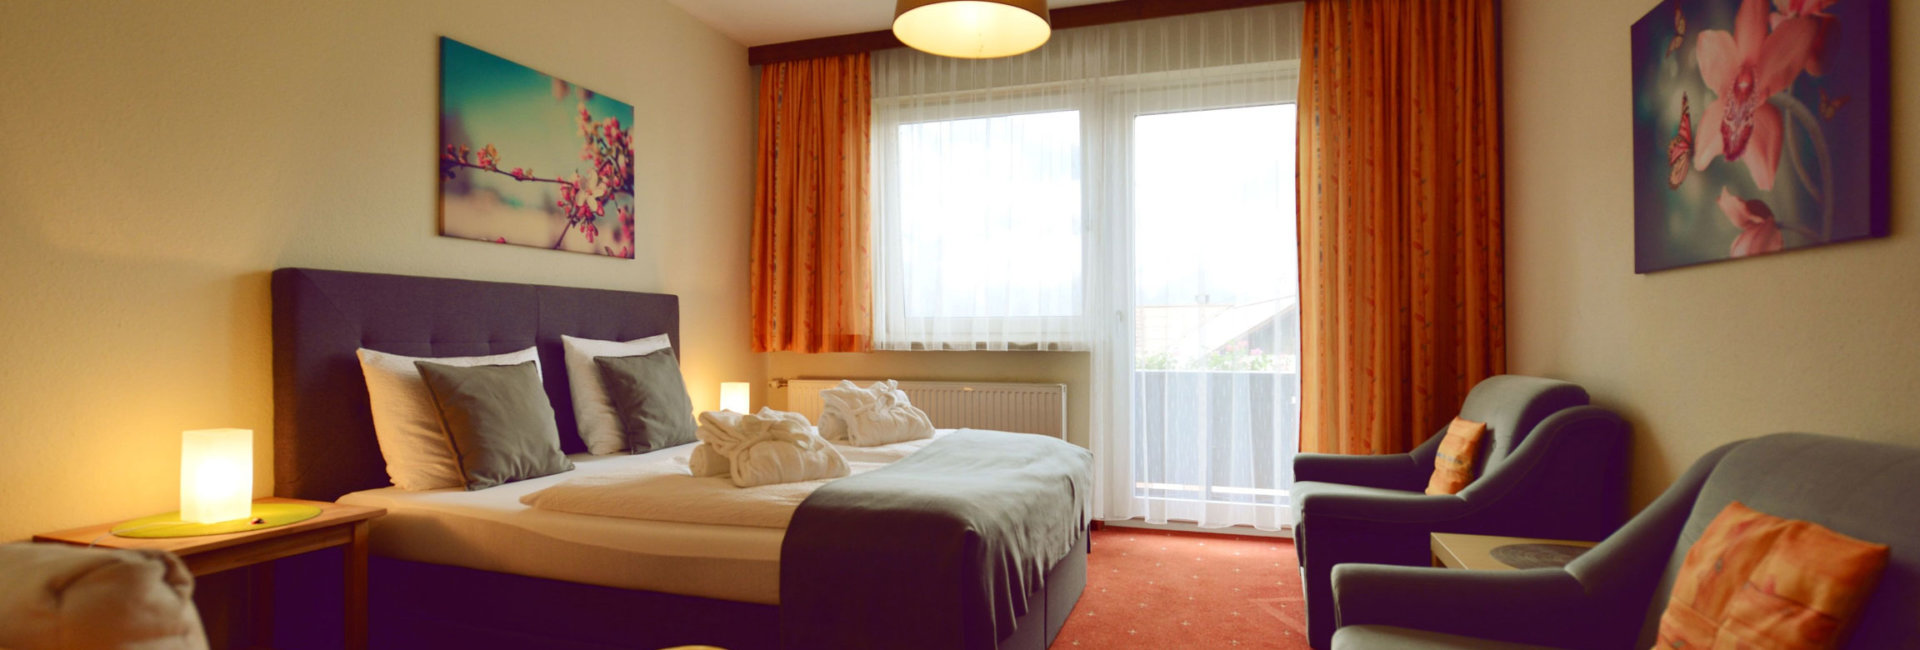 Gasthof-Golob-Zimmer